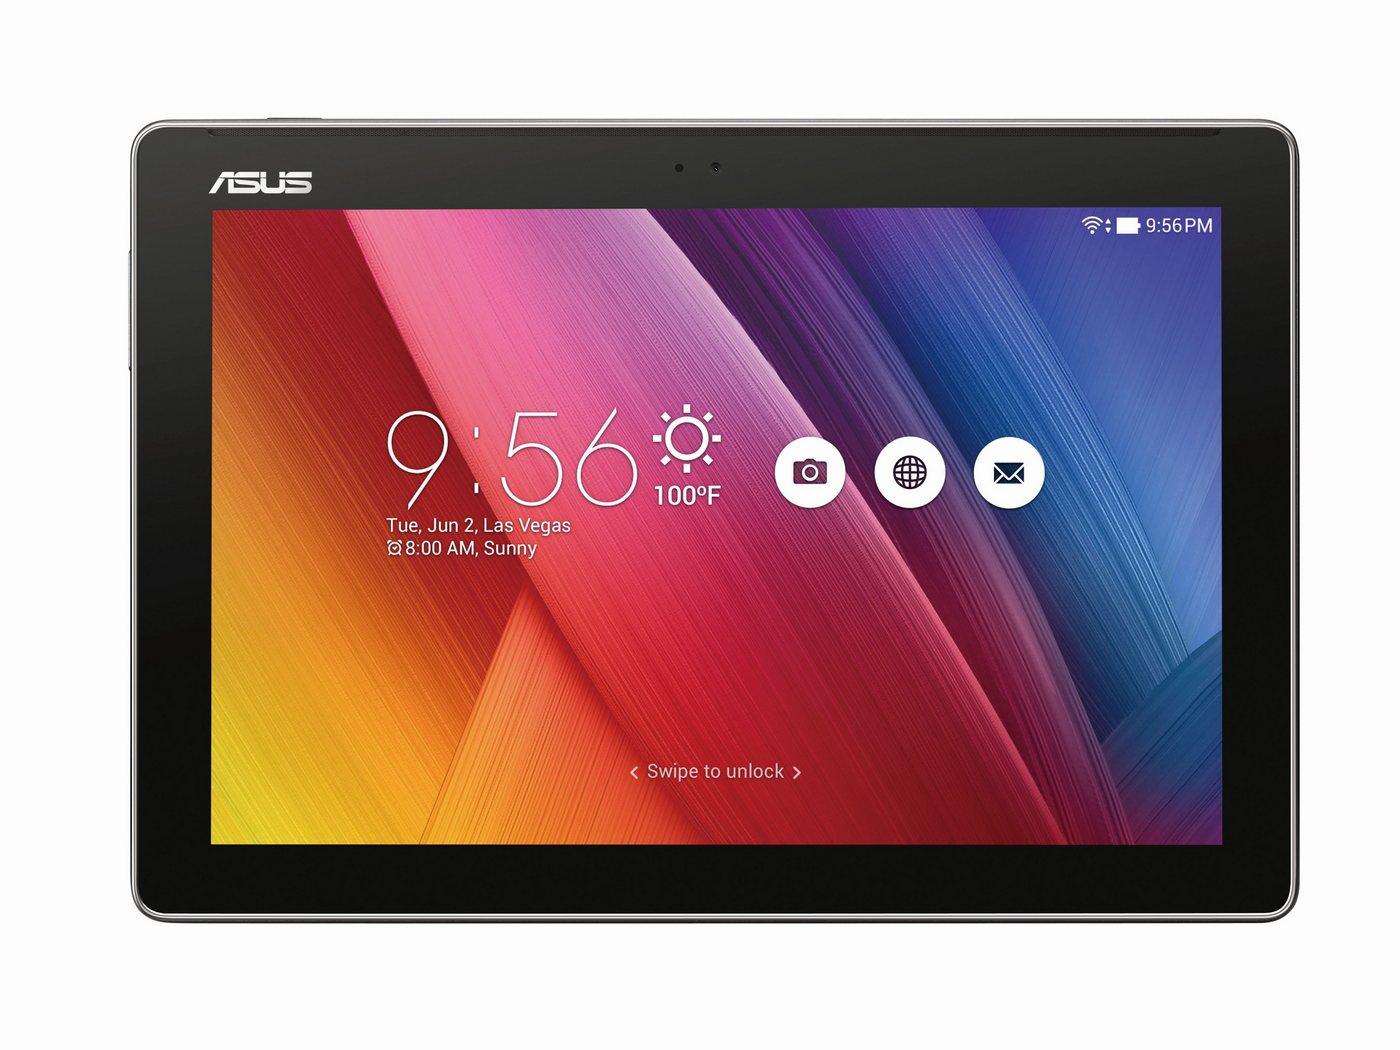 ASUS ZenPad 10 Z300M-6A092A »Quad-Core, 25,7cm (10,1), 128 GB, 2 GB« - Preisvergleich